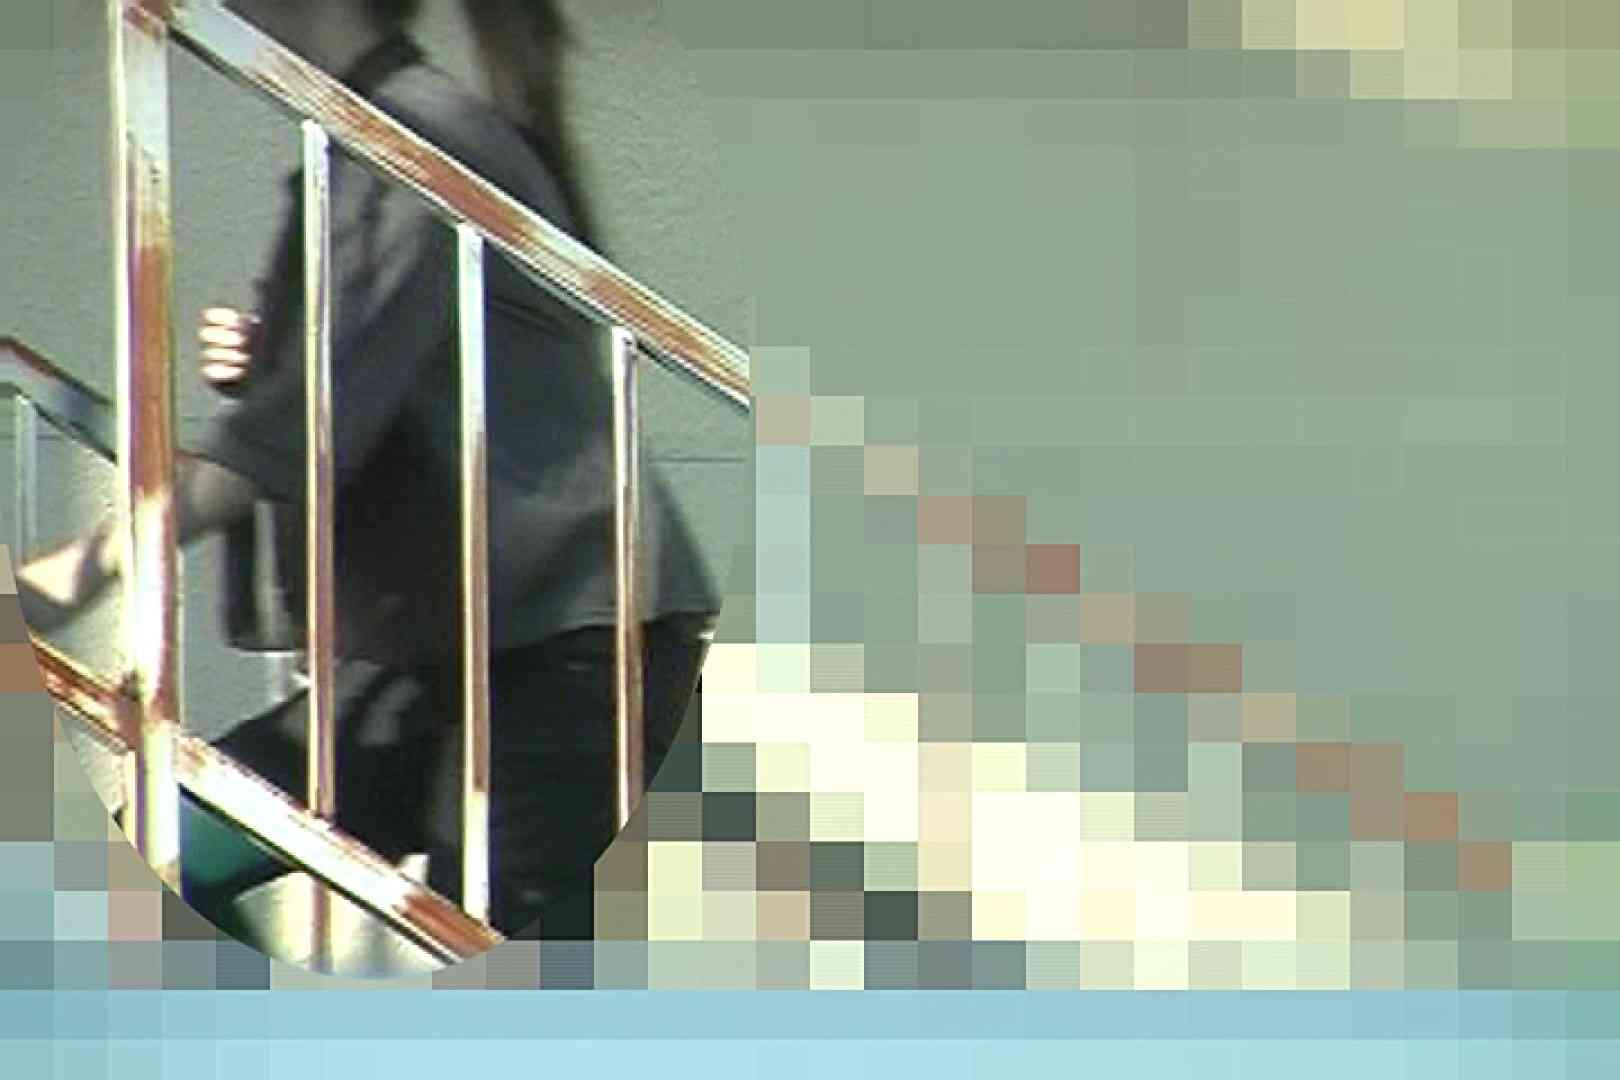 Aquaな露天風呂Vol.25 露天風呂編 | 盗撮シリーズ  91PIX 1